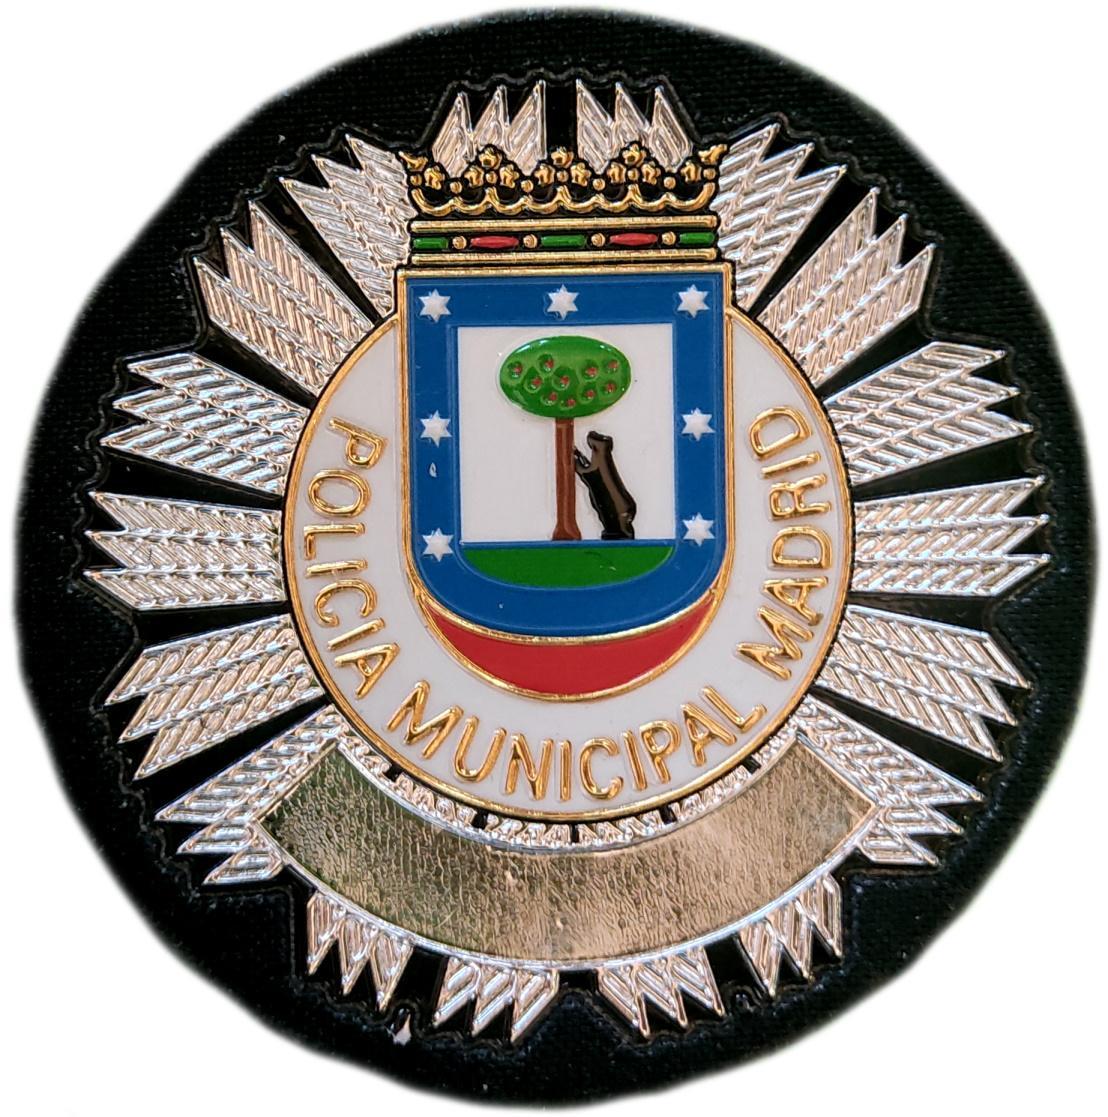 Policía Municipal Madrid parche insignia emblema distintivo de pecho